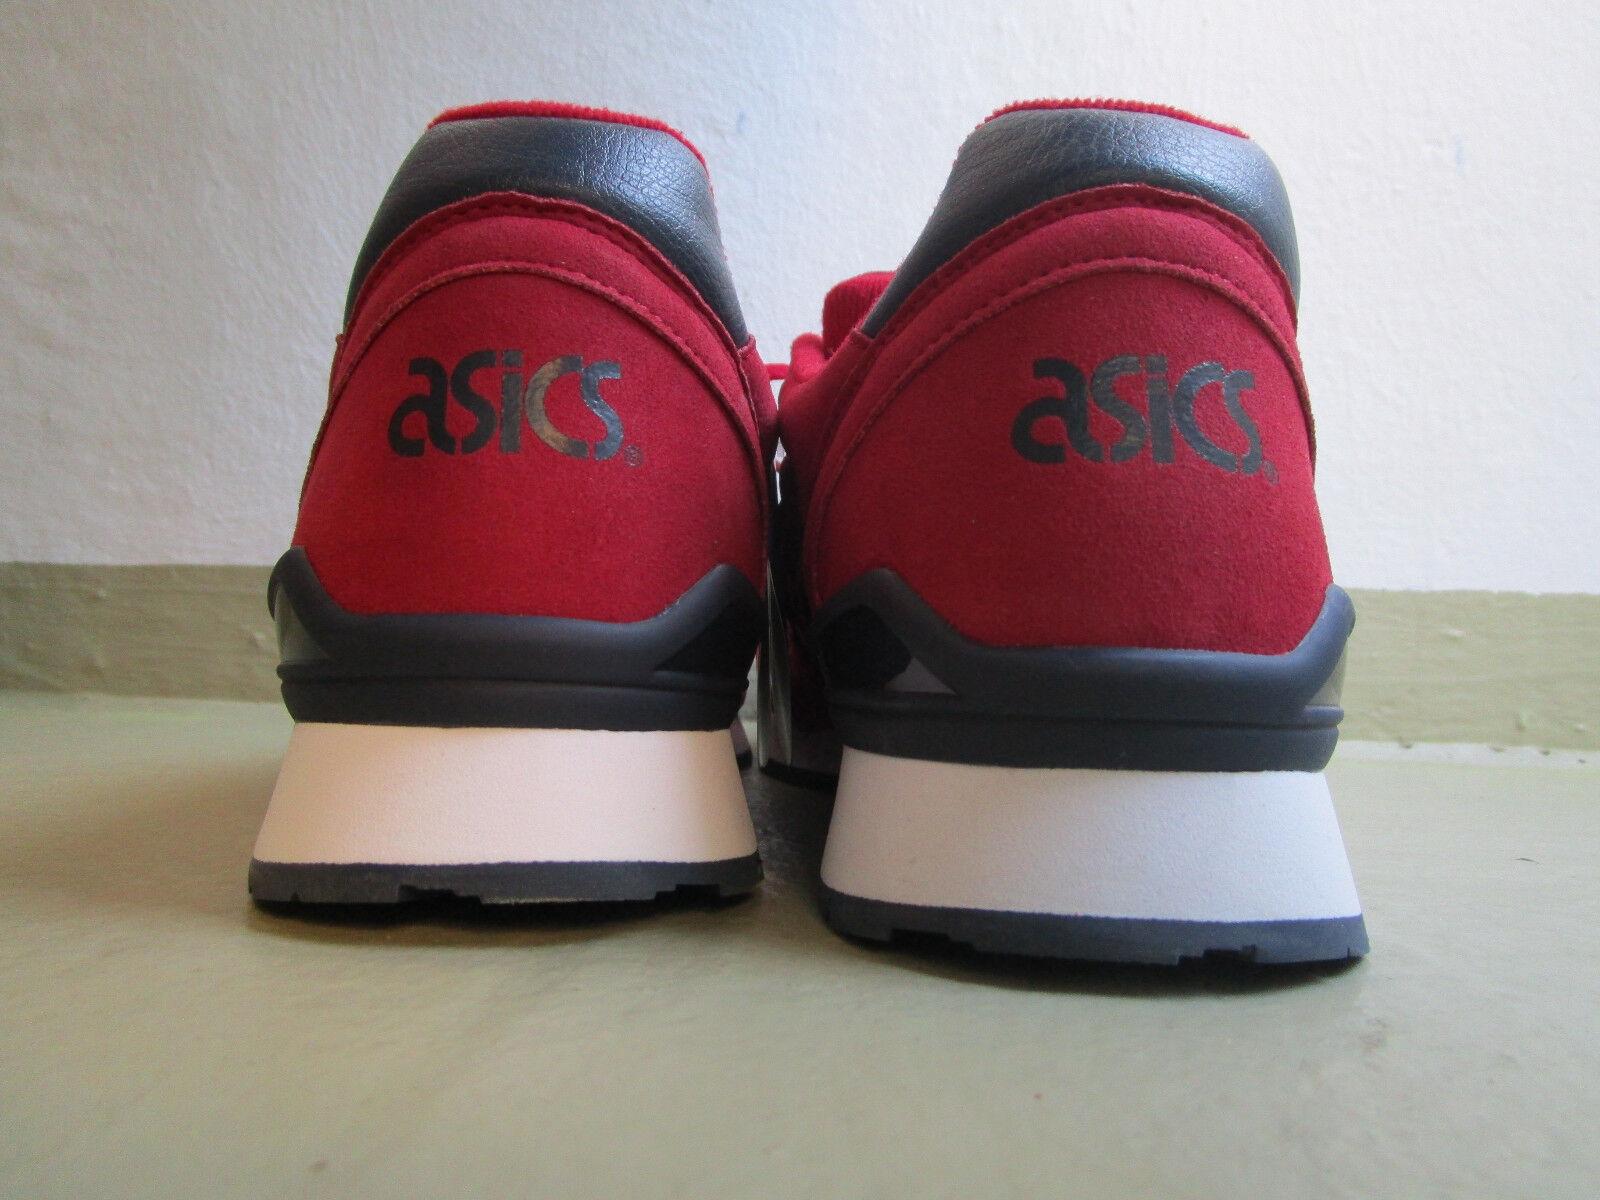 Billig 45 gute Qualität Asics Gel-Atlanis 45 Billig Burgundy/ROT 62630a